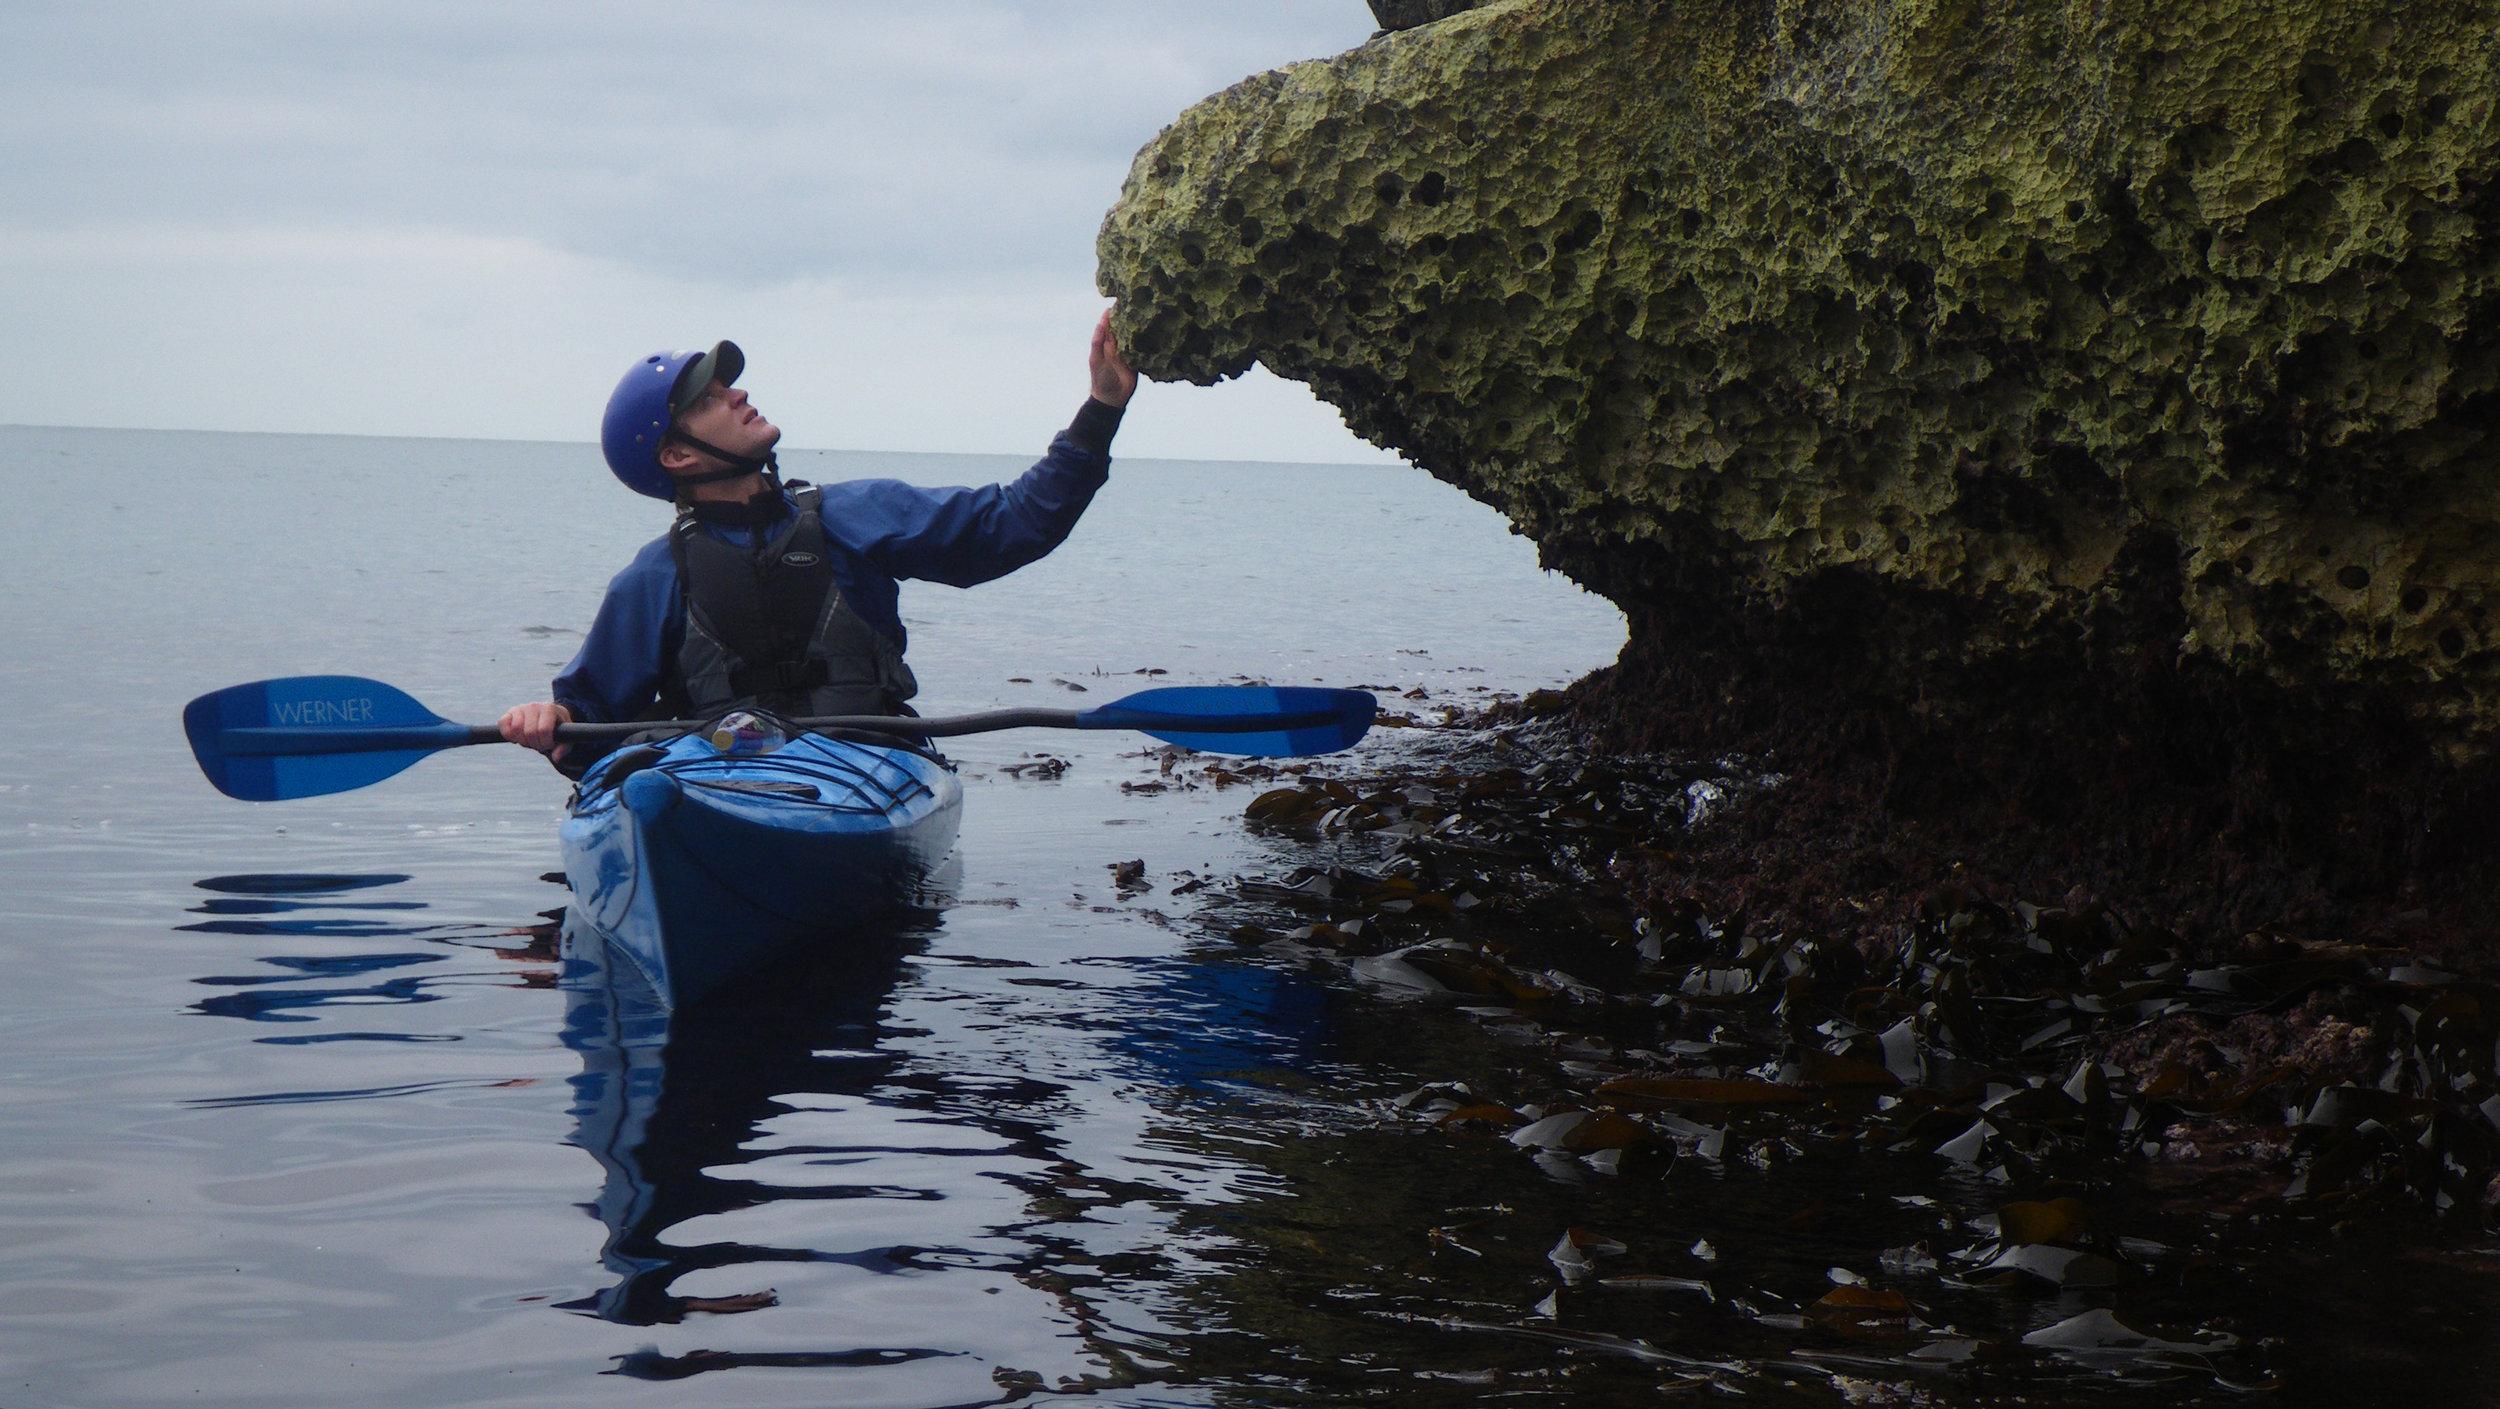 sea kayaking along the dorset coast